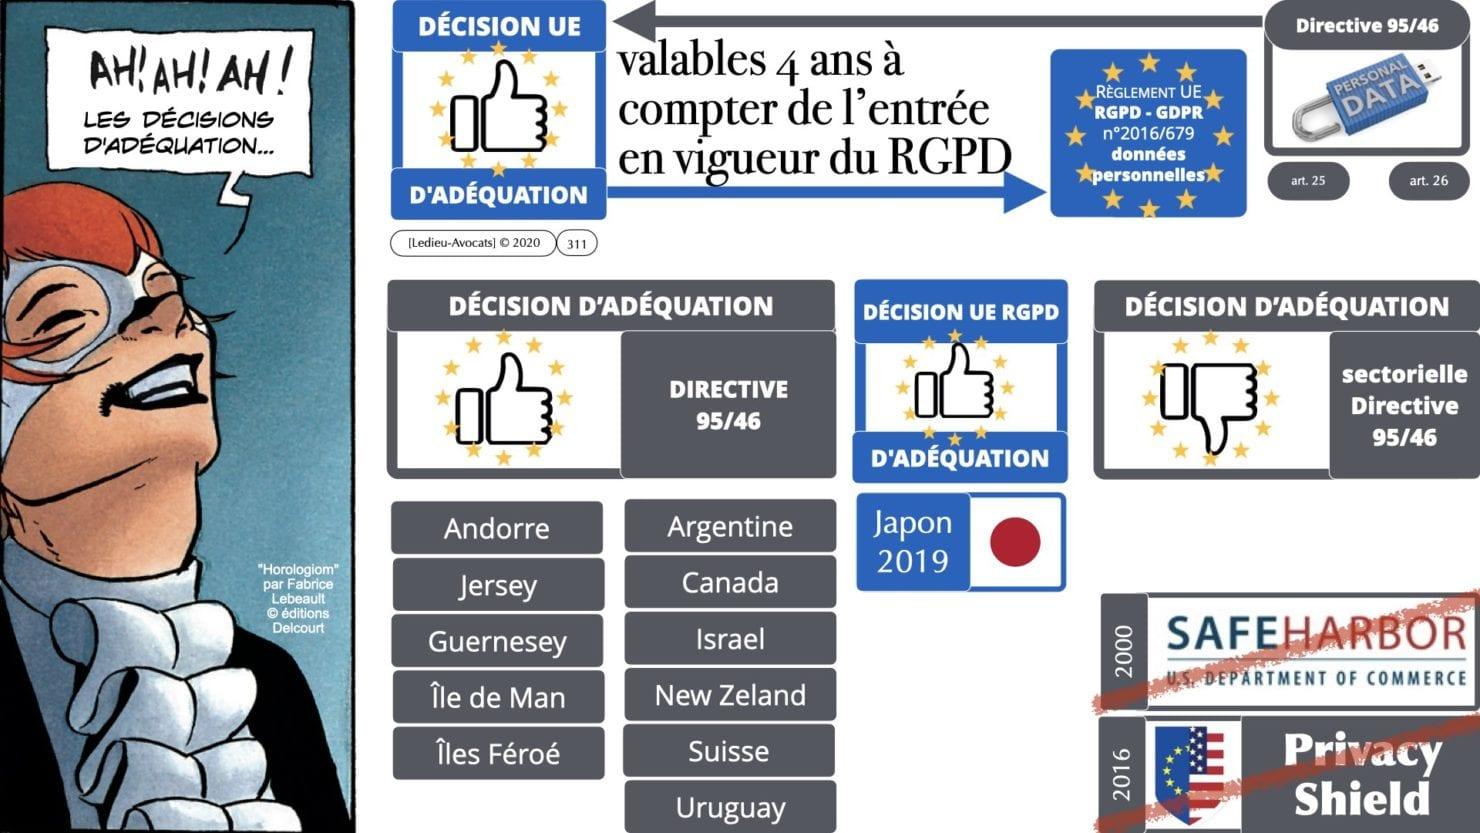 RGPD e-Privacy principes actualité jurisprudence ©Ledieu-Avocats 25-06-2021.311